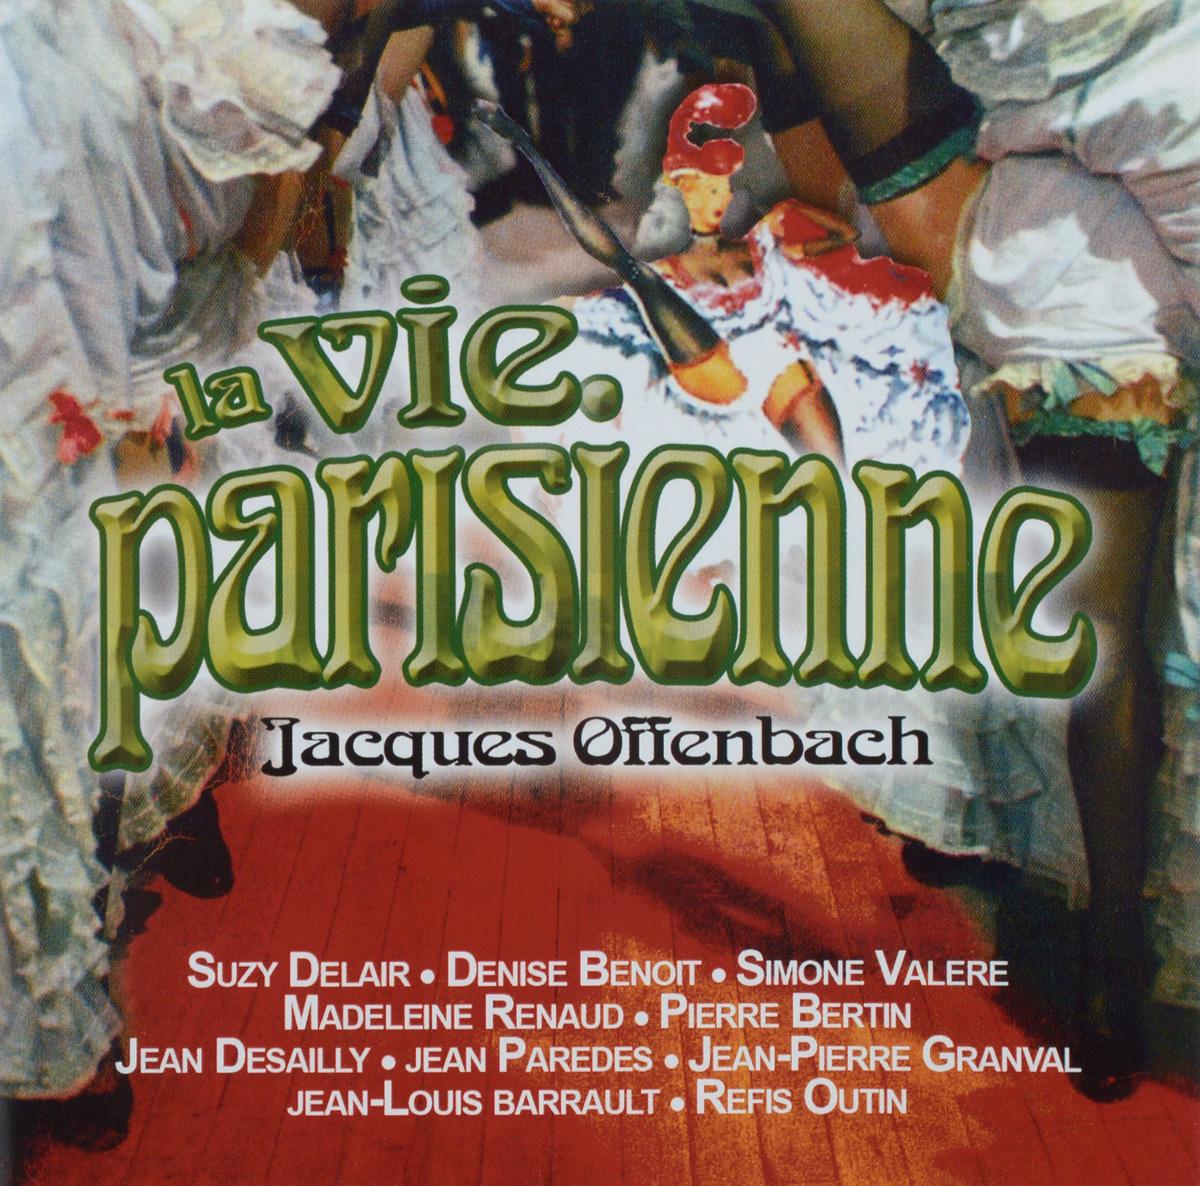 Jacques Offenbach. La Vie Parisienne иоганн штраус паоло россини u offenbach strauss rossini offenbach u v intermezzo